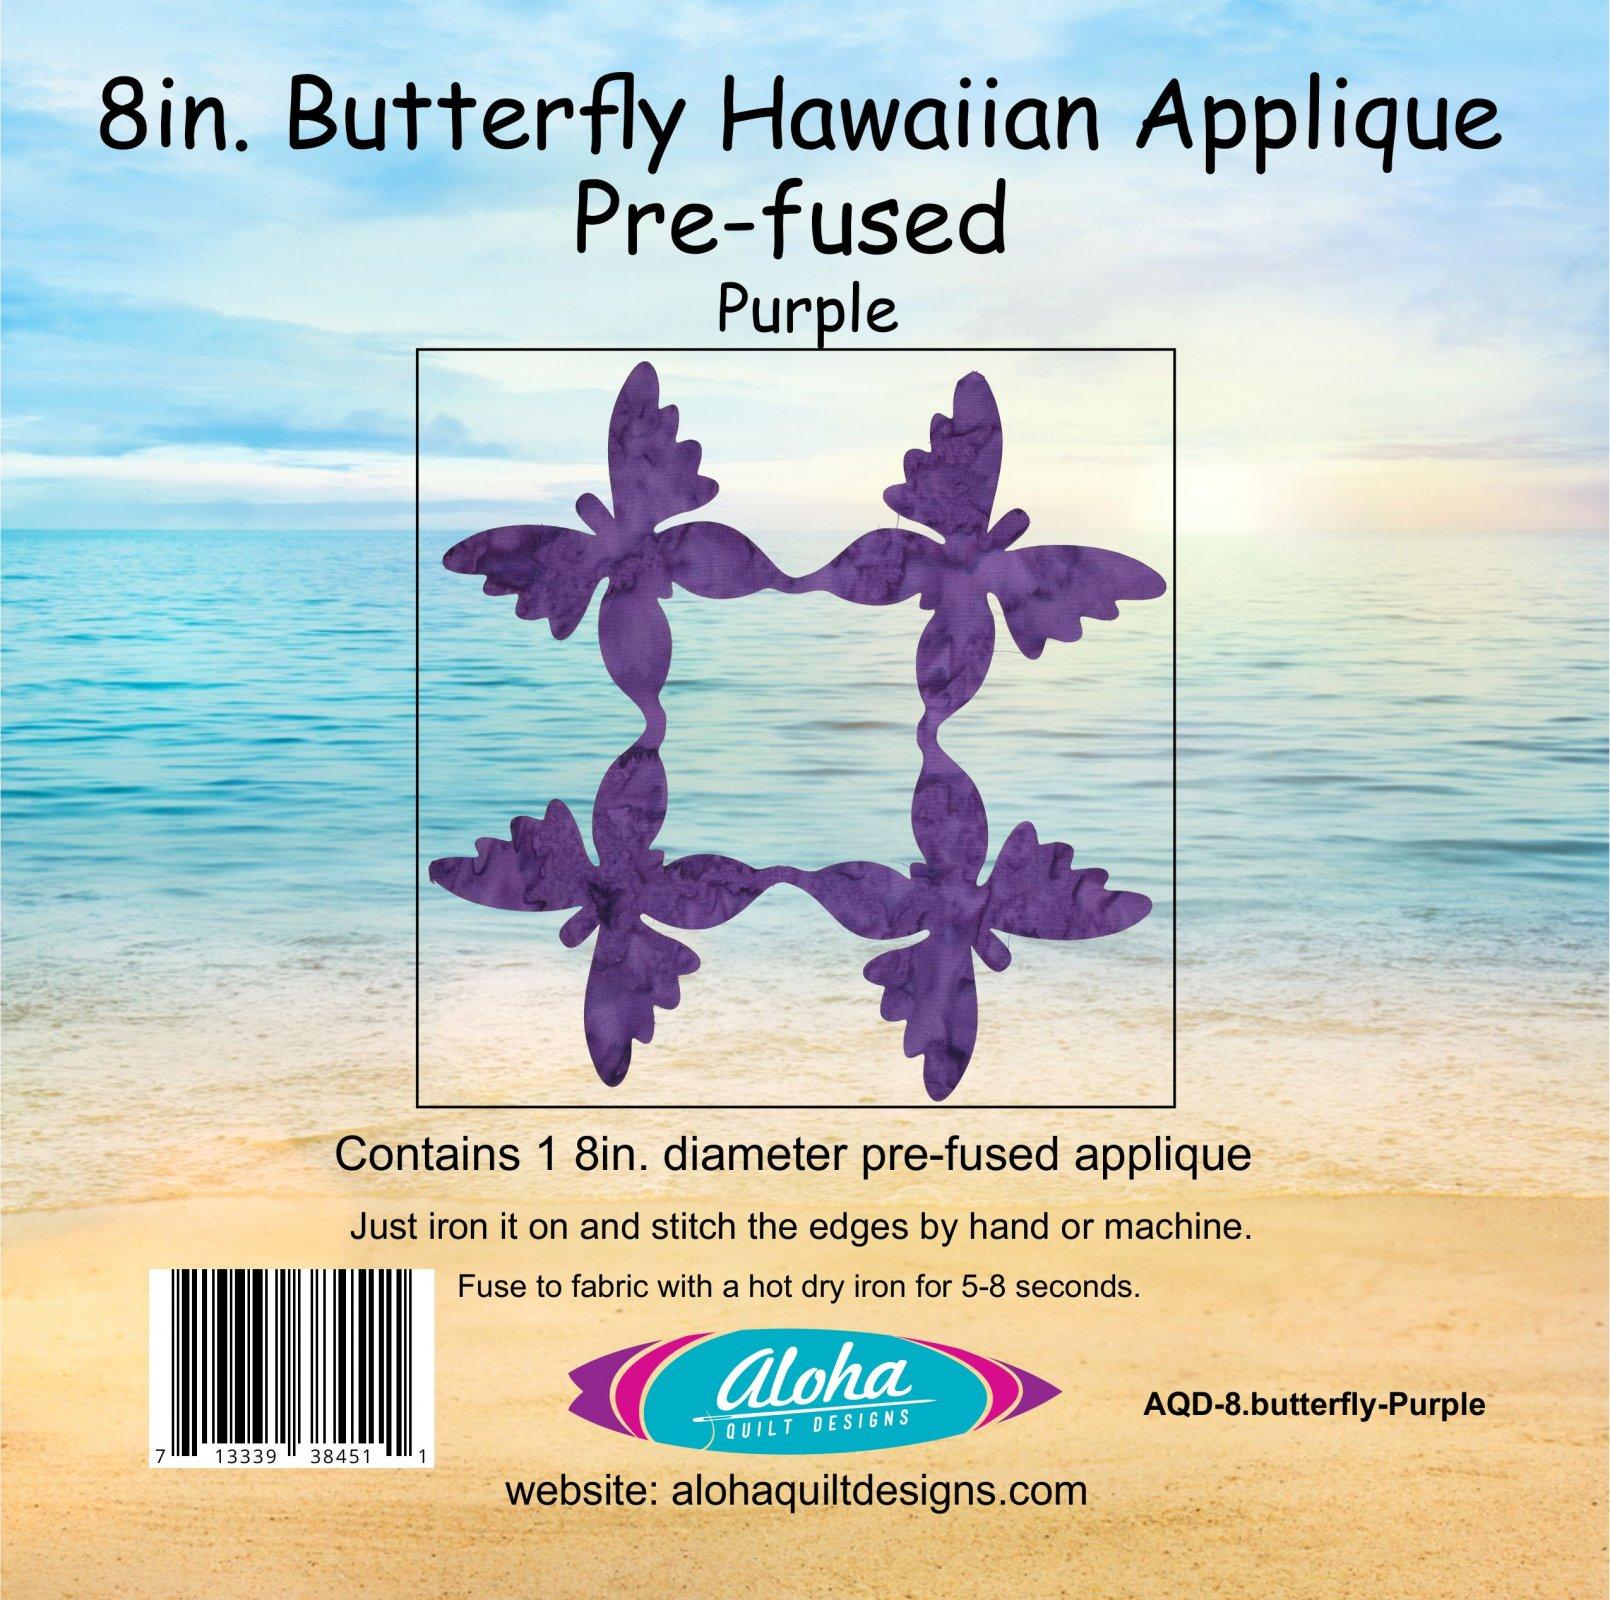 8in. Butterfly Hawaiian Fusible Applique